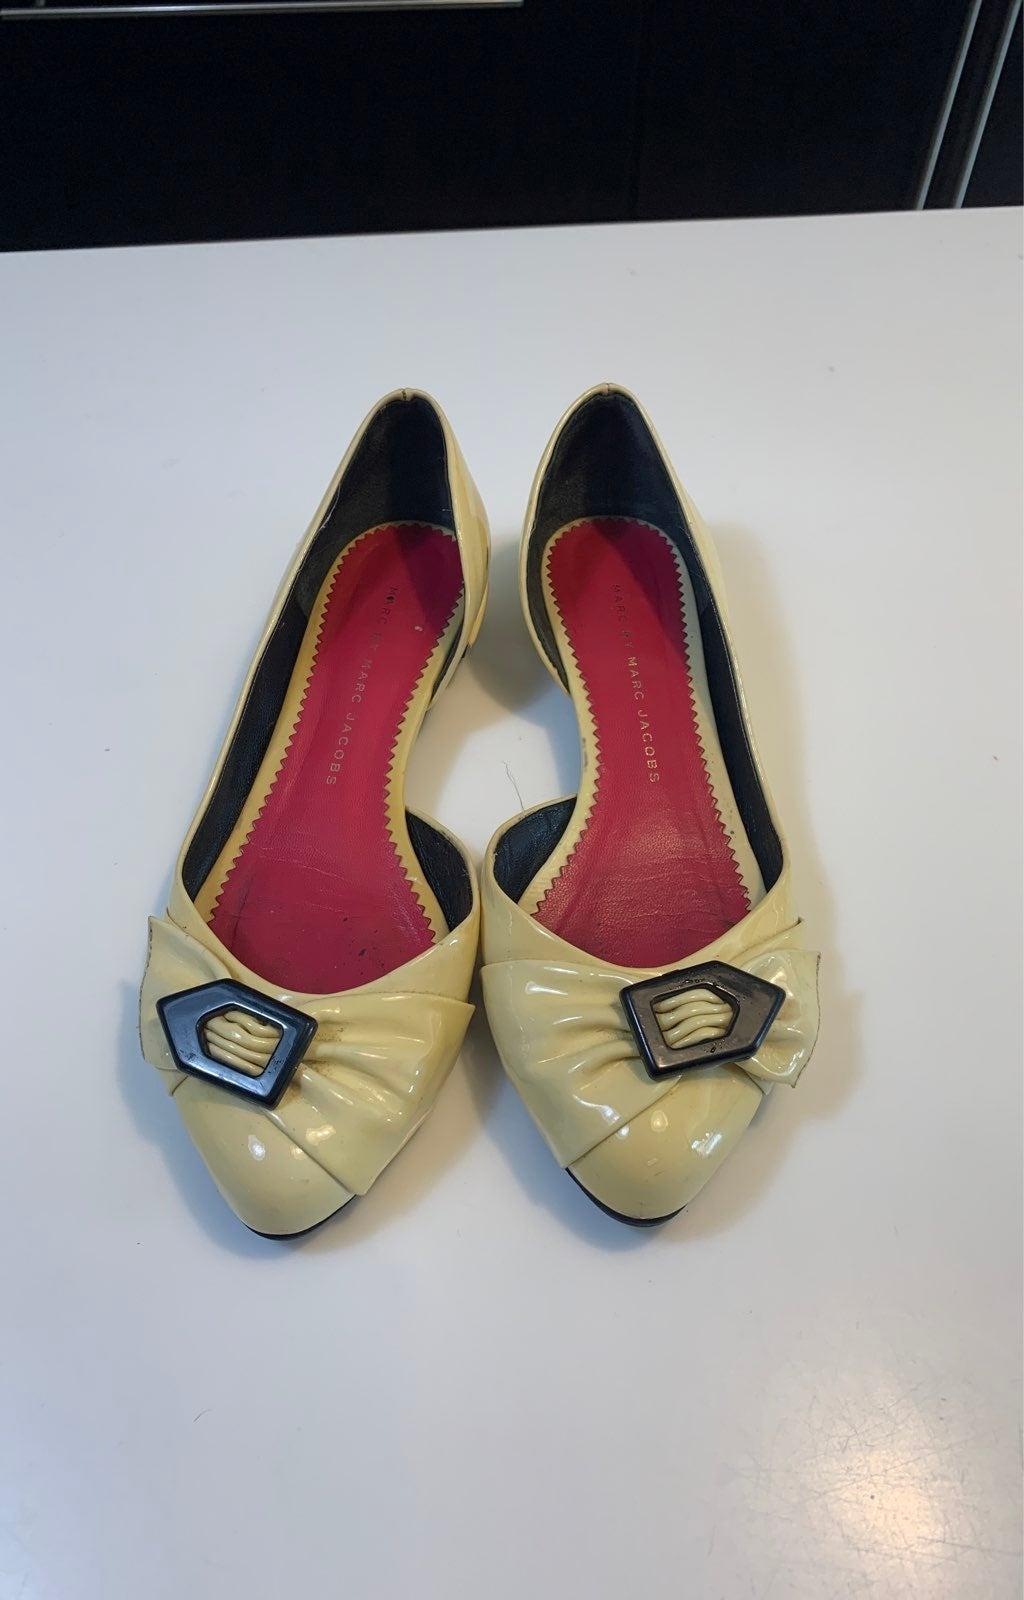 Mark jacobs vanilla patent leather mary